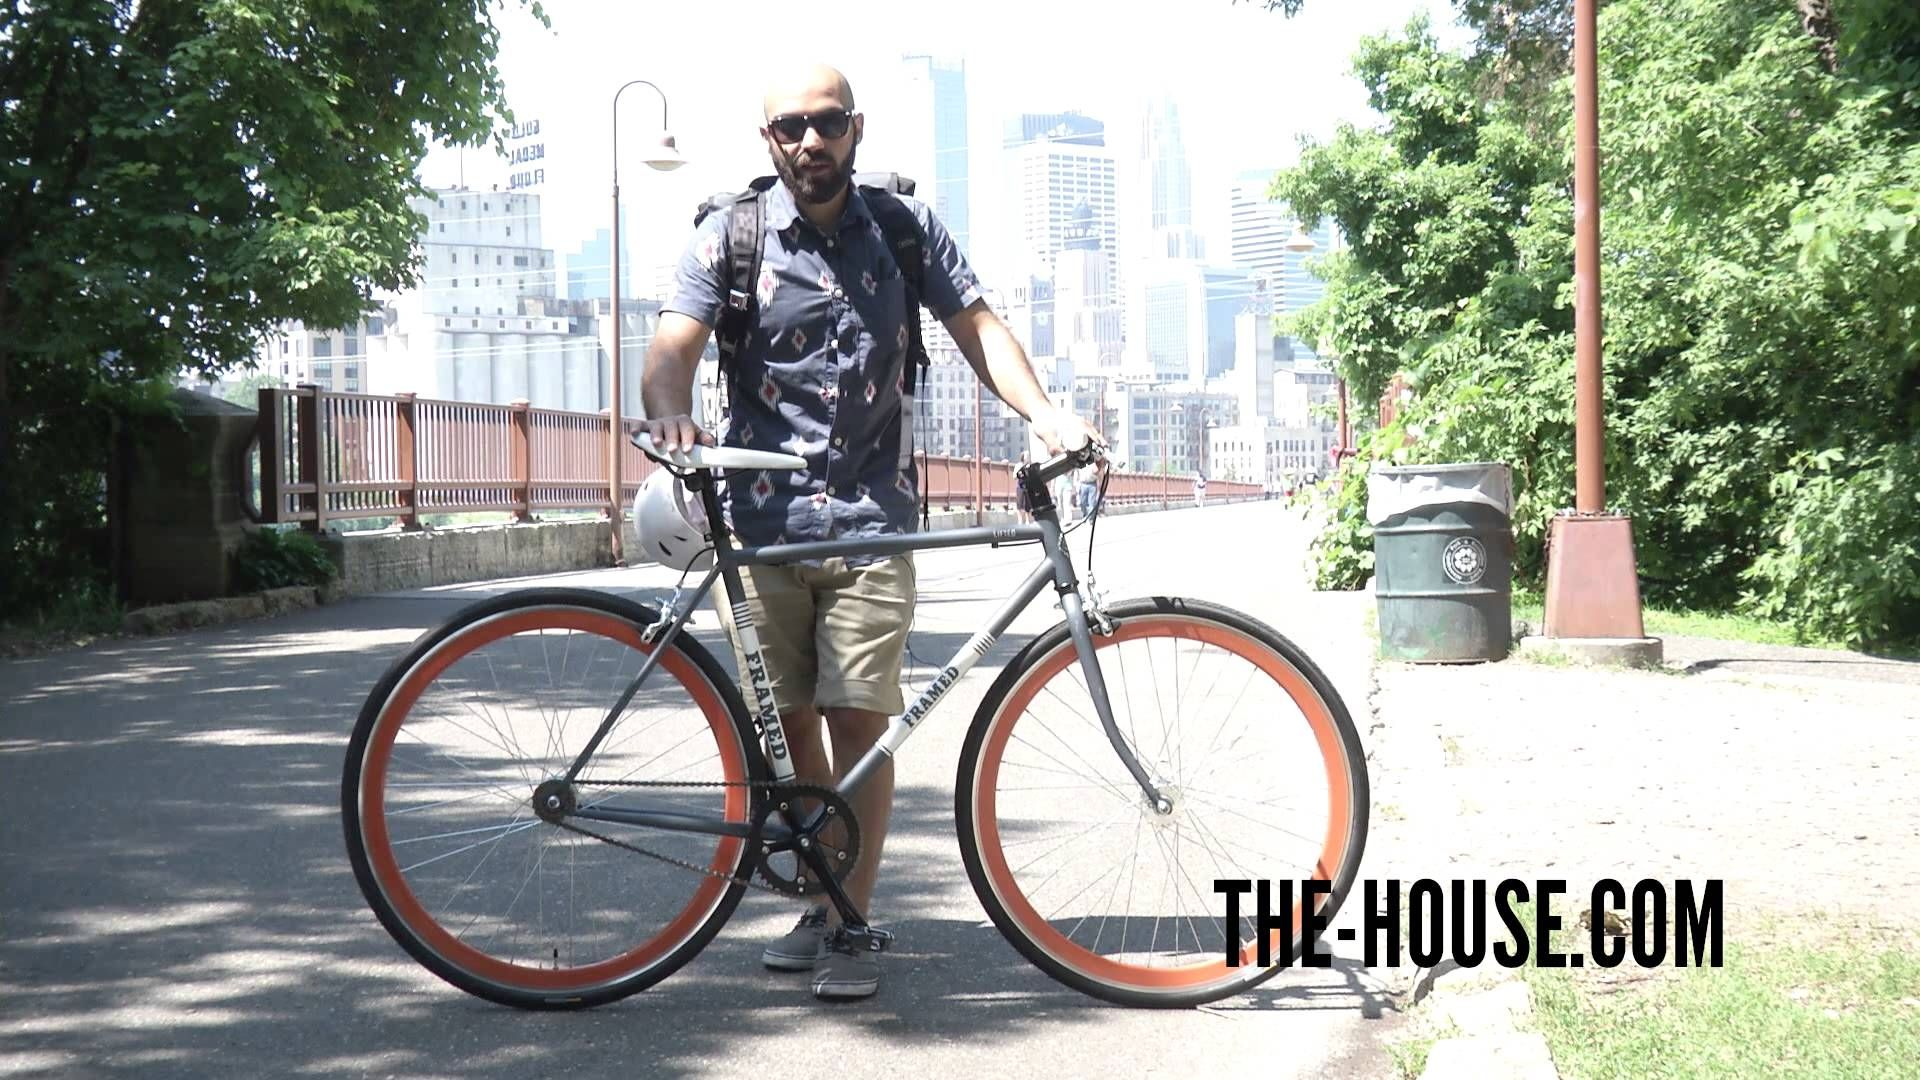 Framed Lifted Flat Bar U Brake Bike Review The House Com